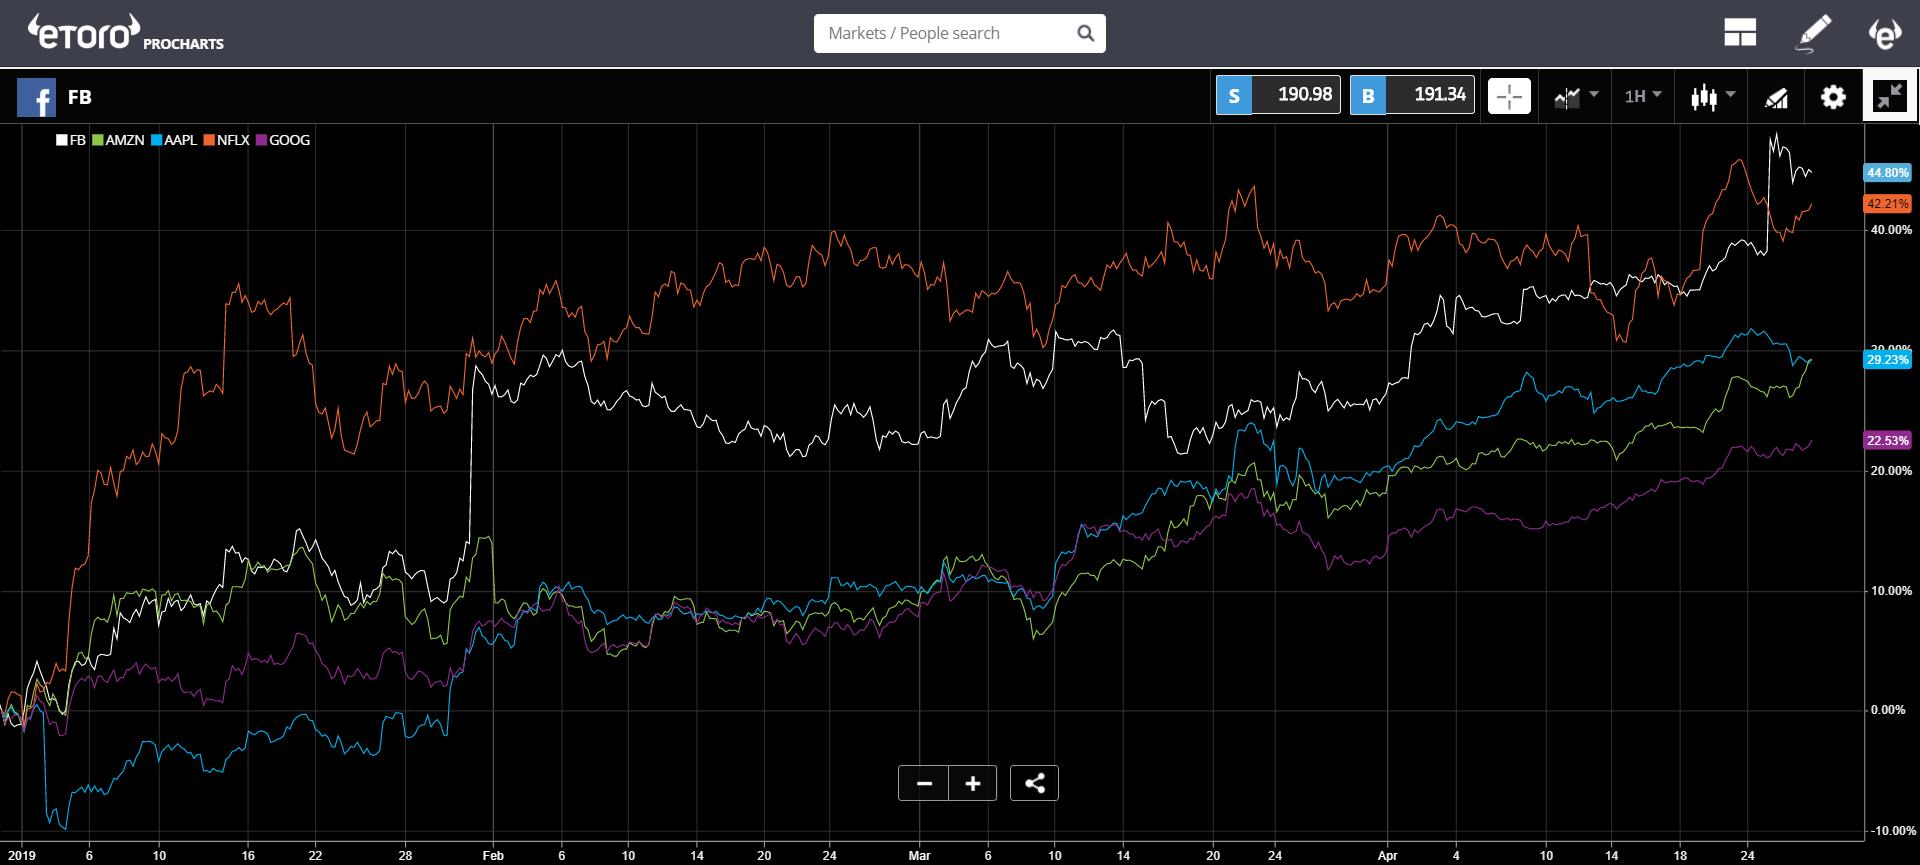 market, cryptocurrency, bitcoin, ethereum, trading, blockchain, crypto